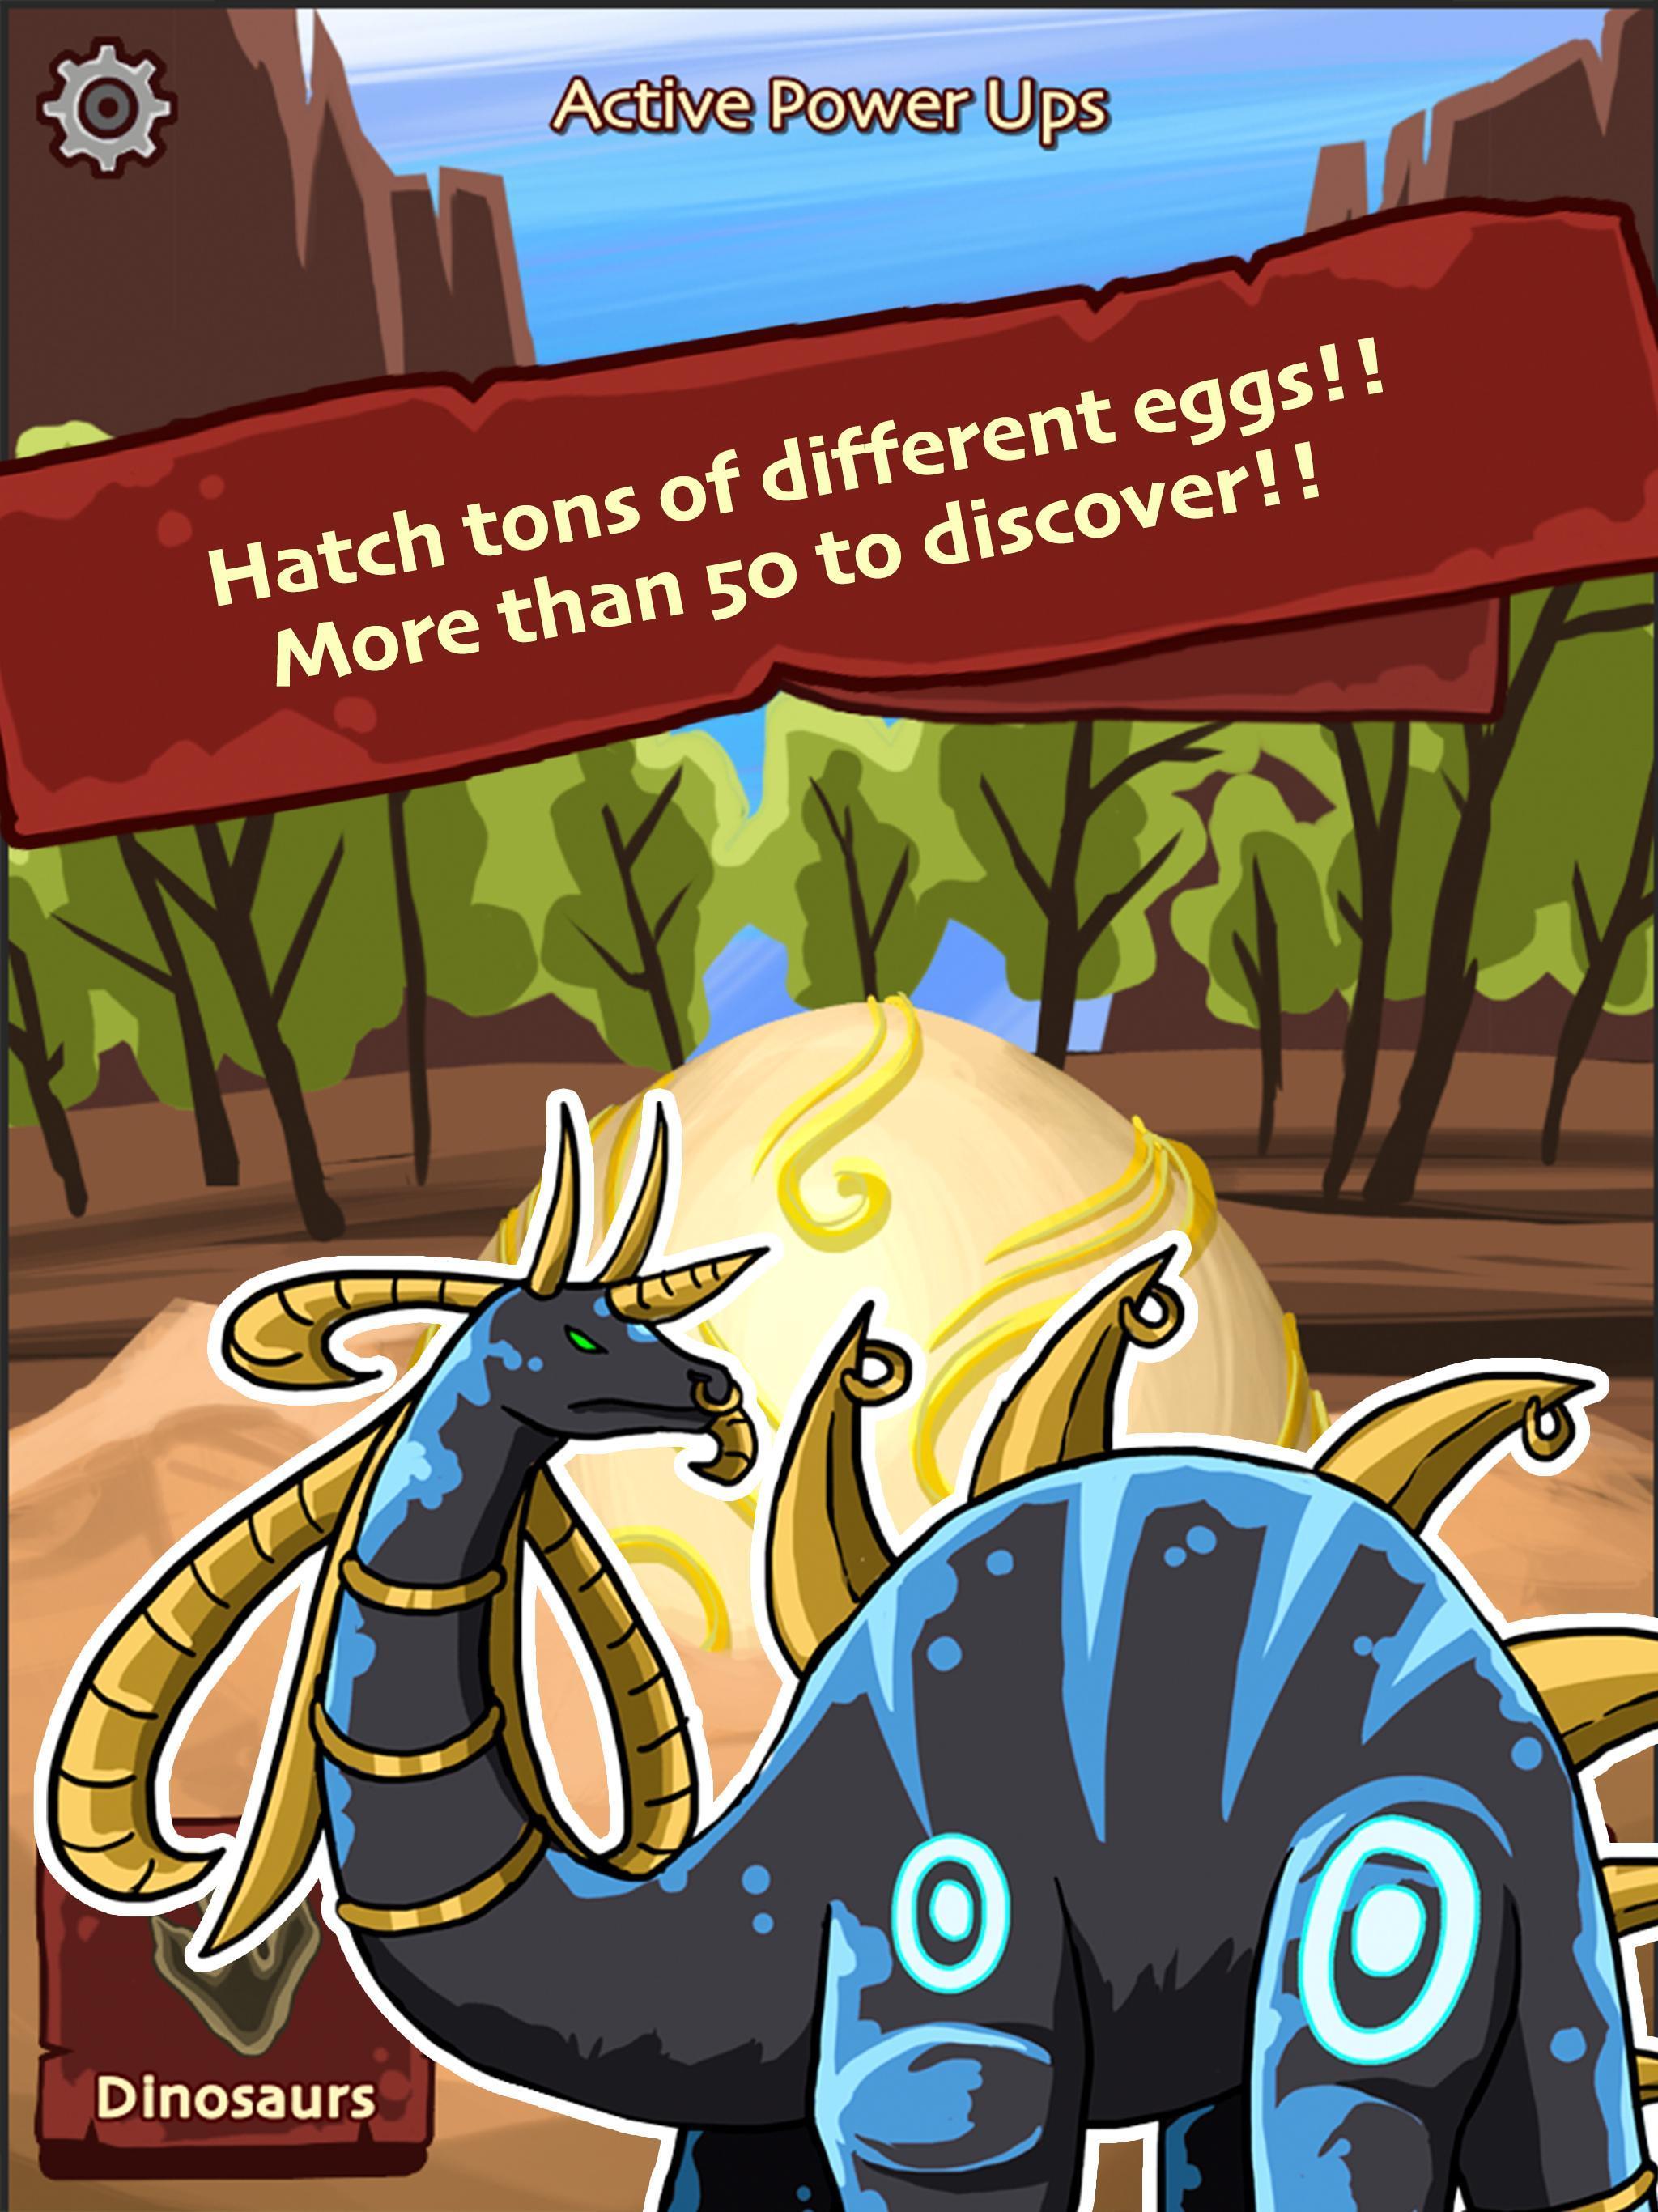 Hatch Dinosaur Eggs - Jurassic World Clicker Games 1.0.7 Screenshot 12